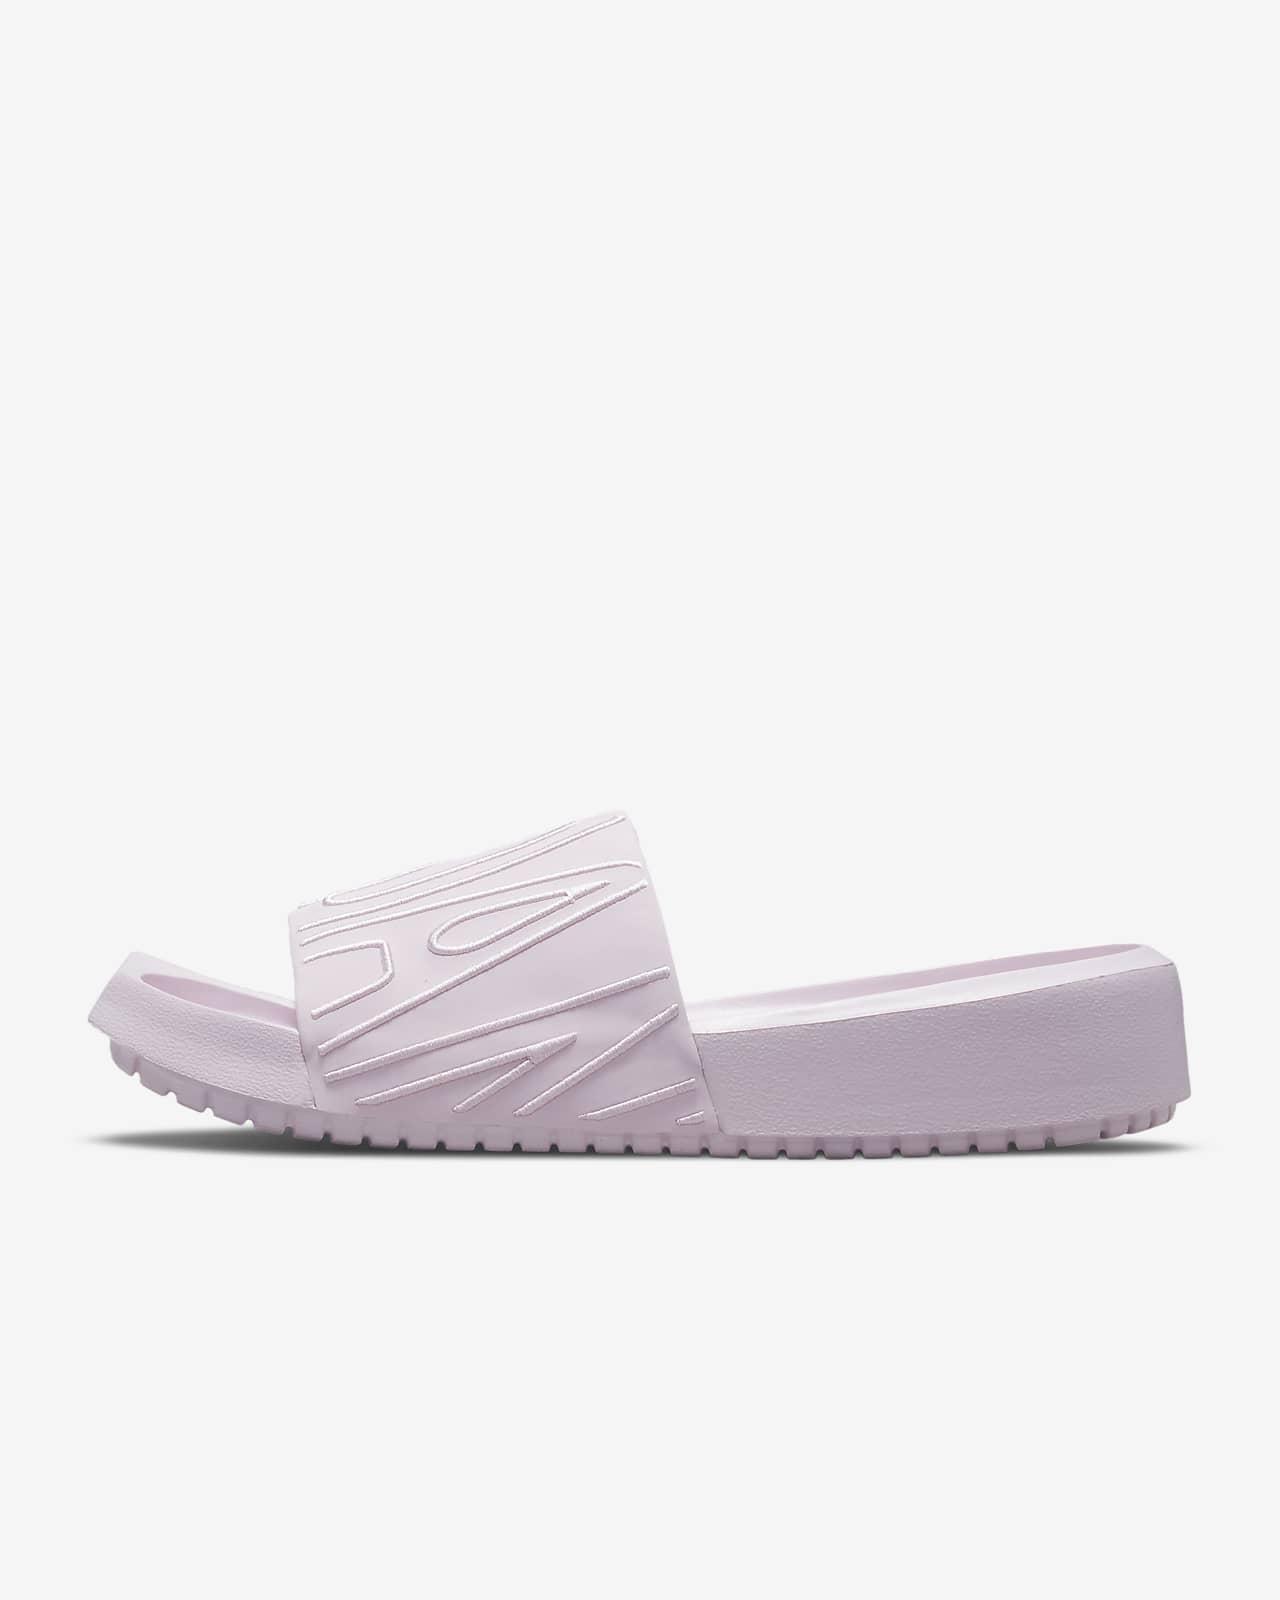 Jordan NOLA 女款拖鞋